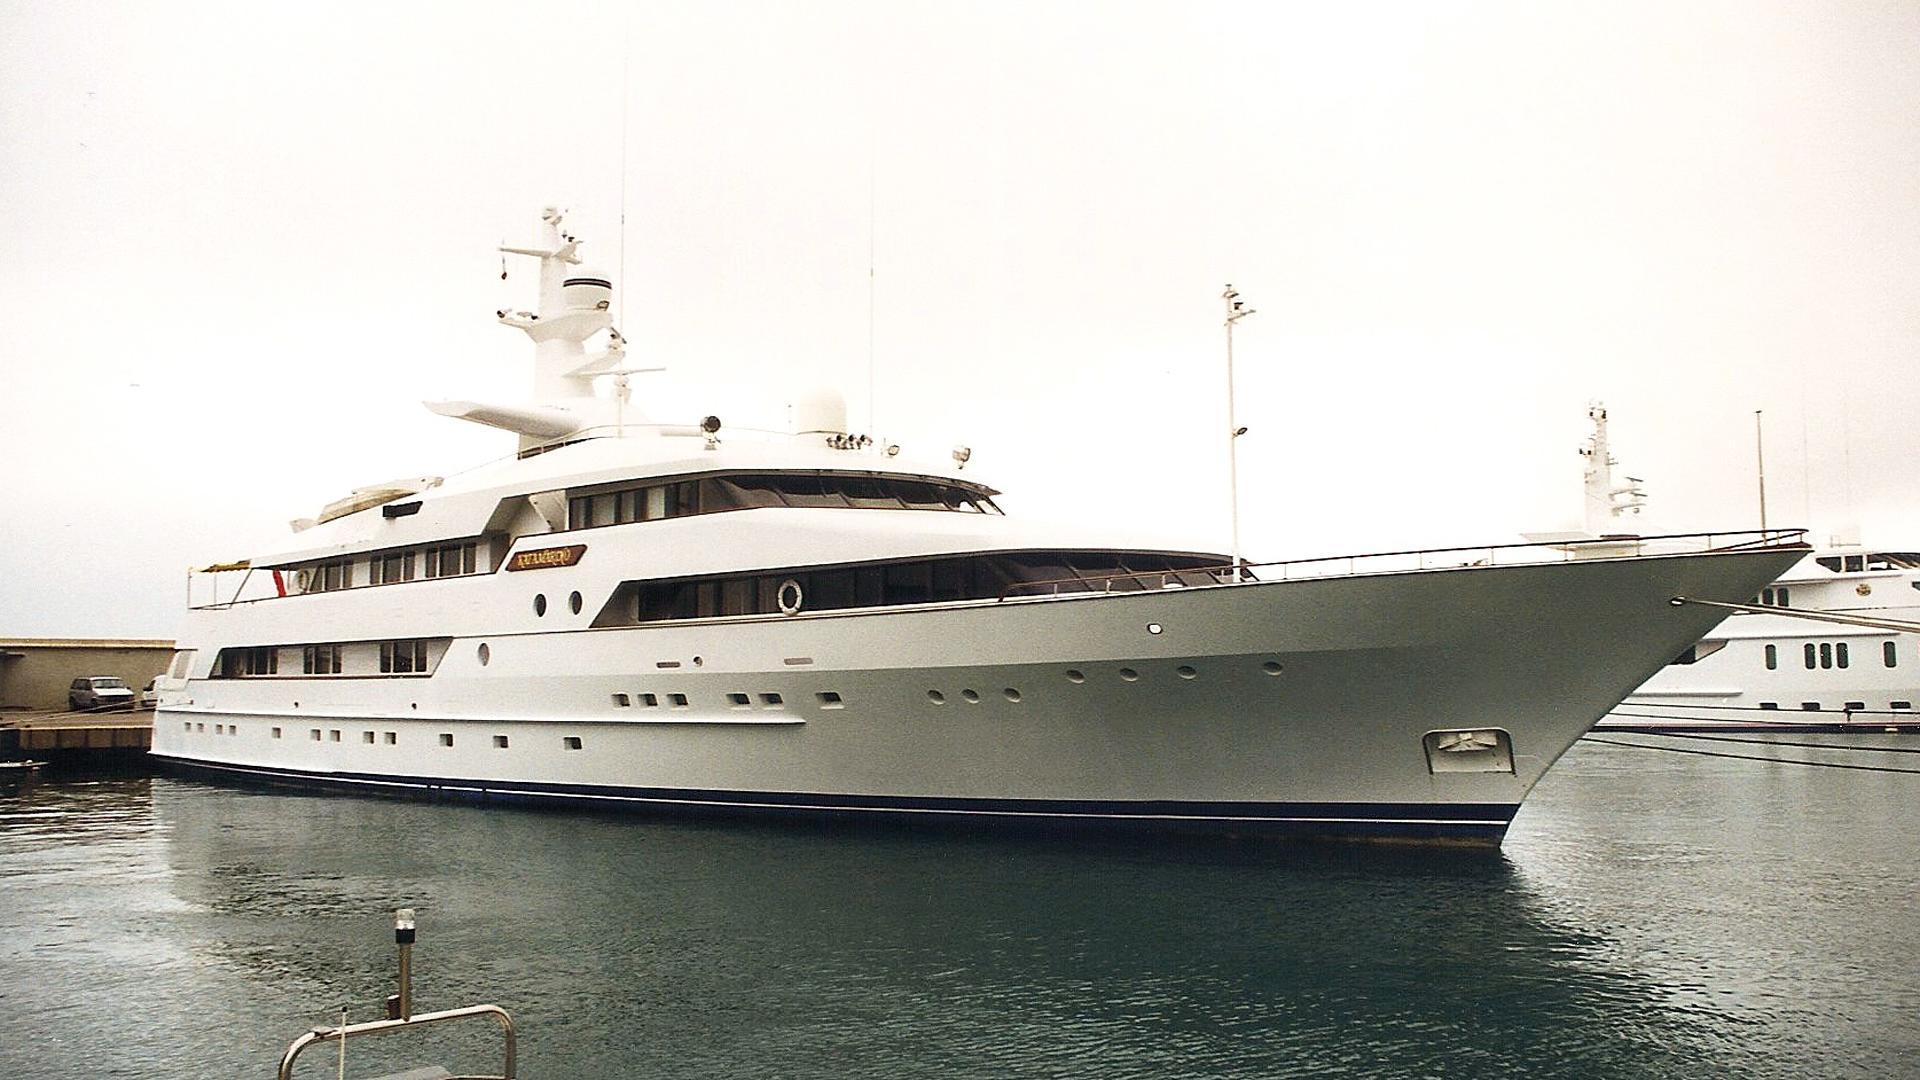 paris-i-motor-yacht-amels-1991-56m-half-profile